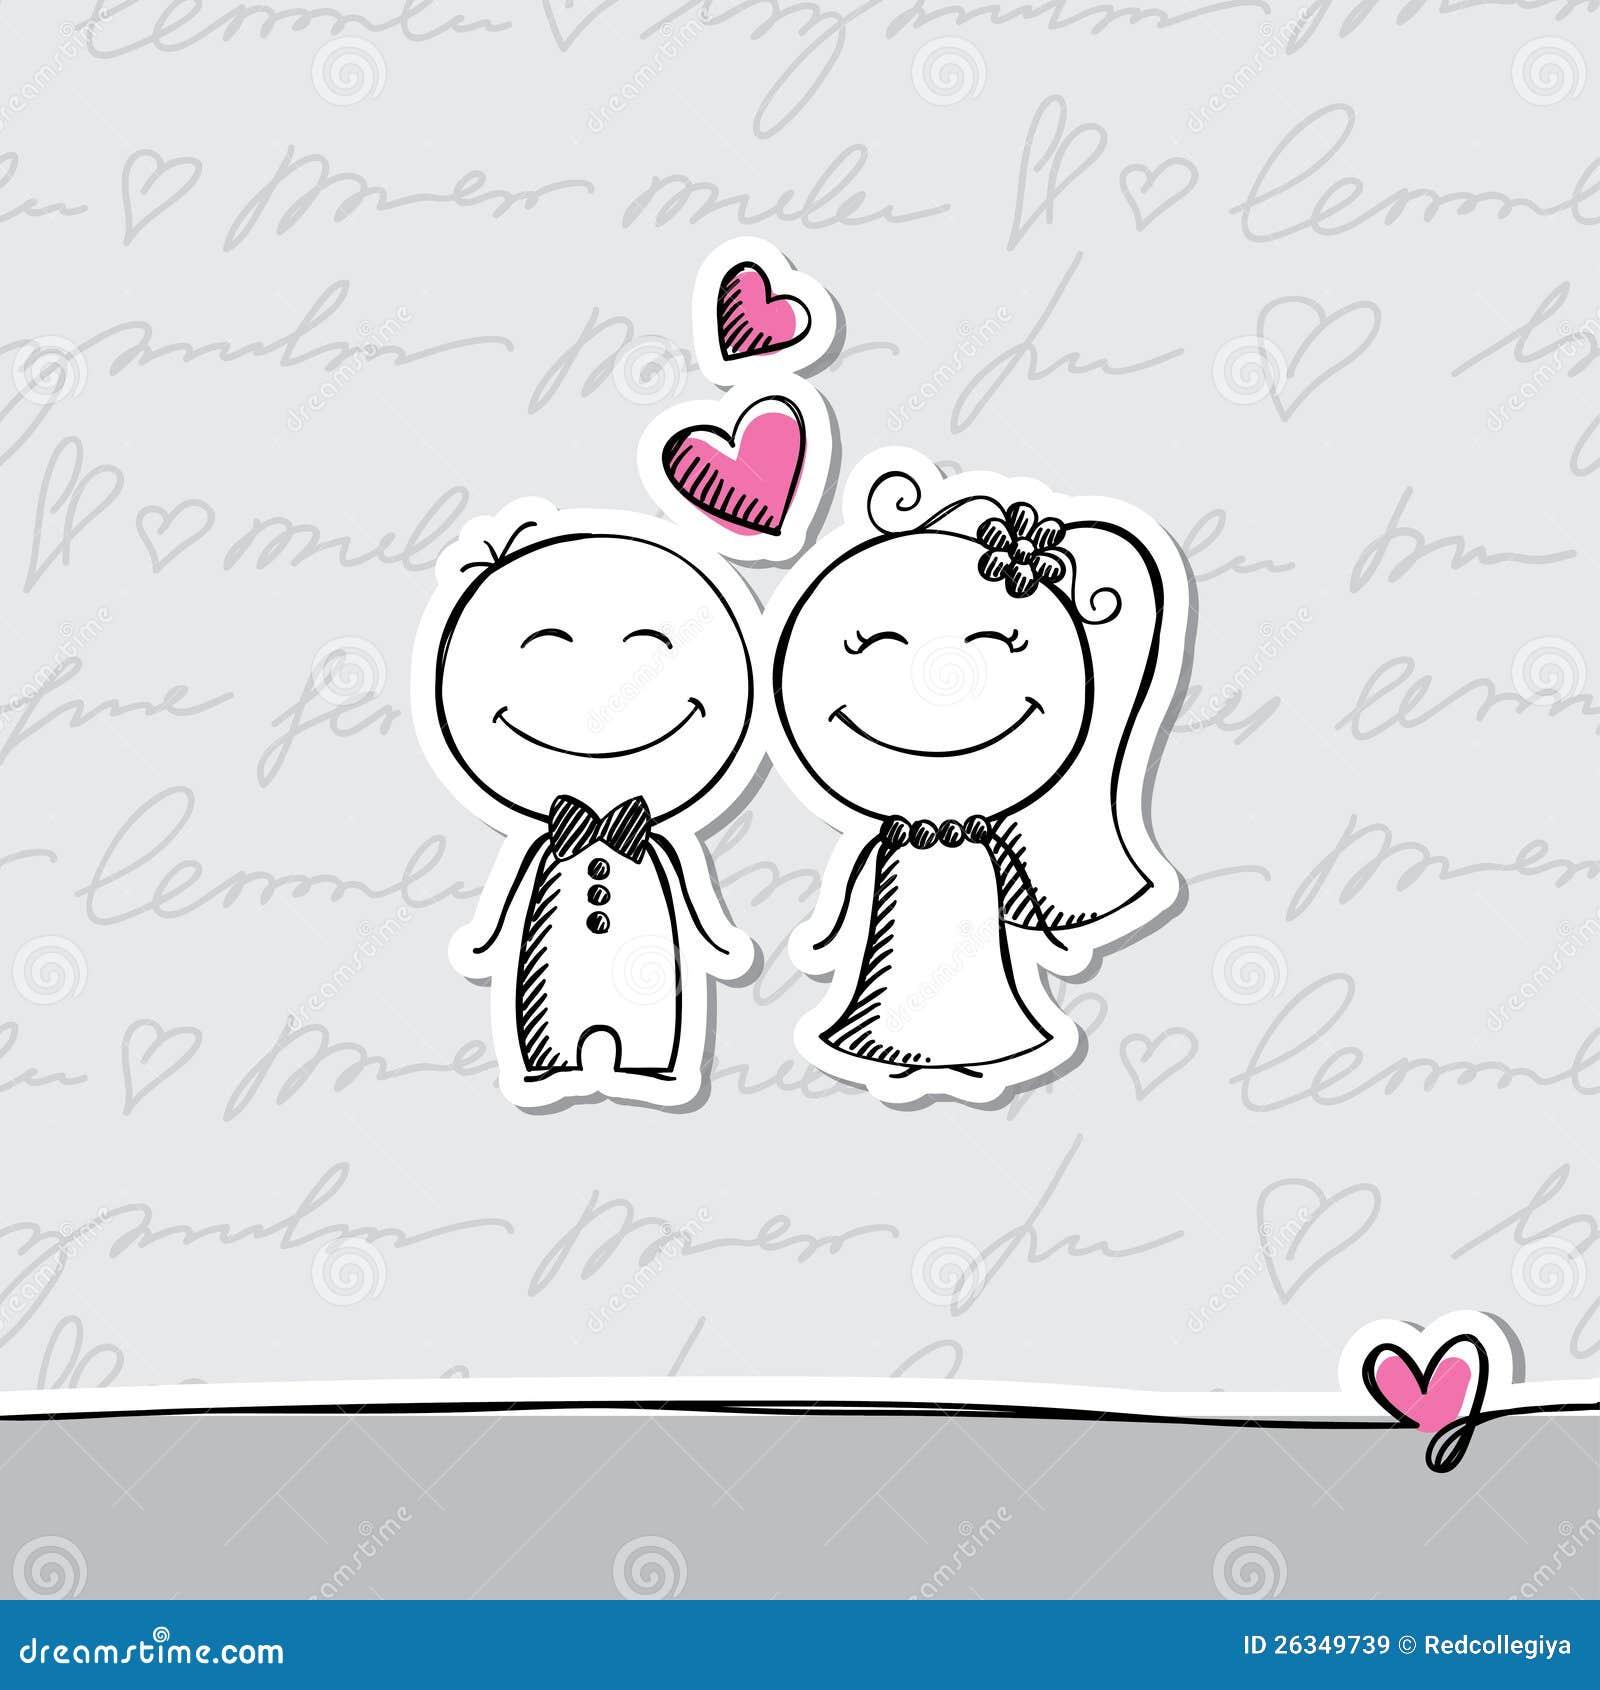 Line Drawing Wedding Couple : Hand drawn wedding couple stock vector illustration of